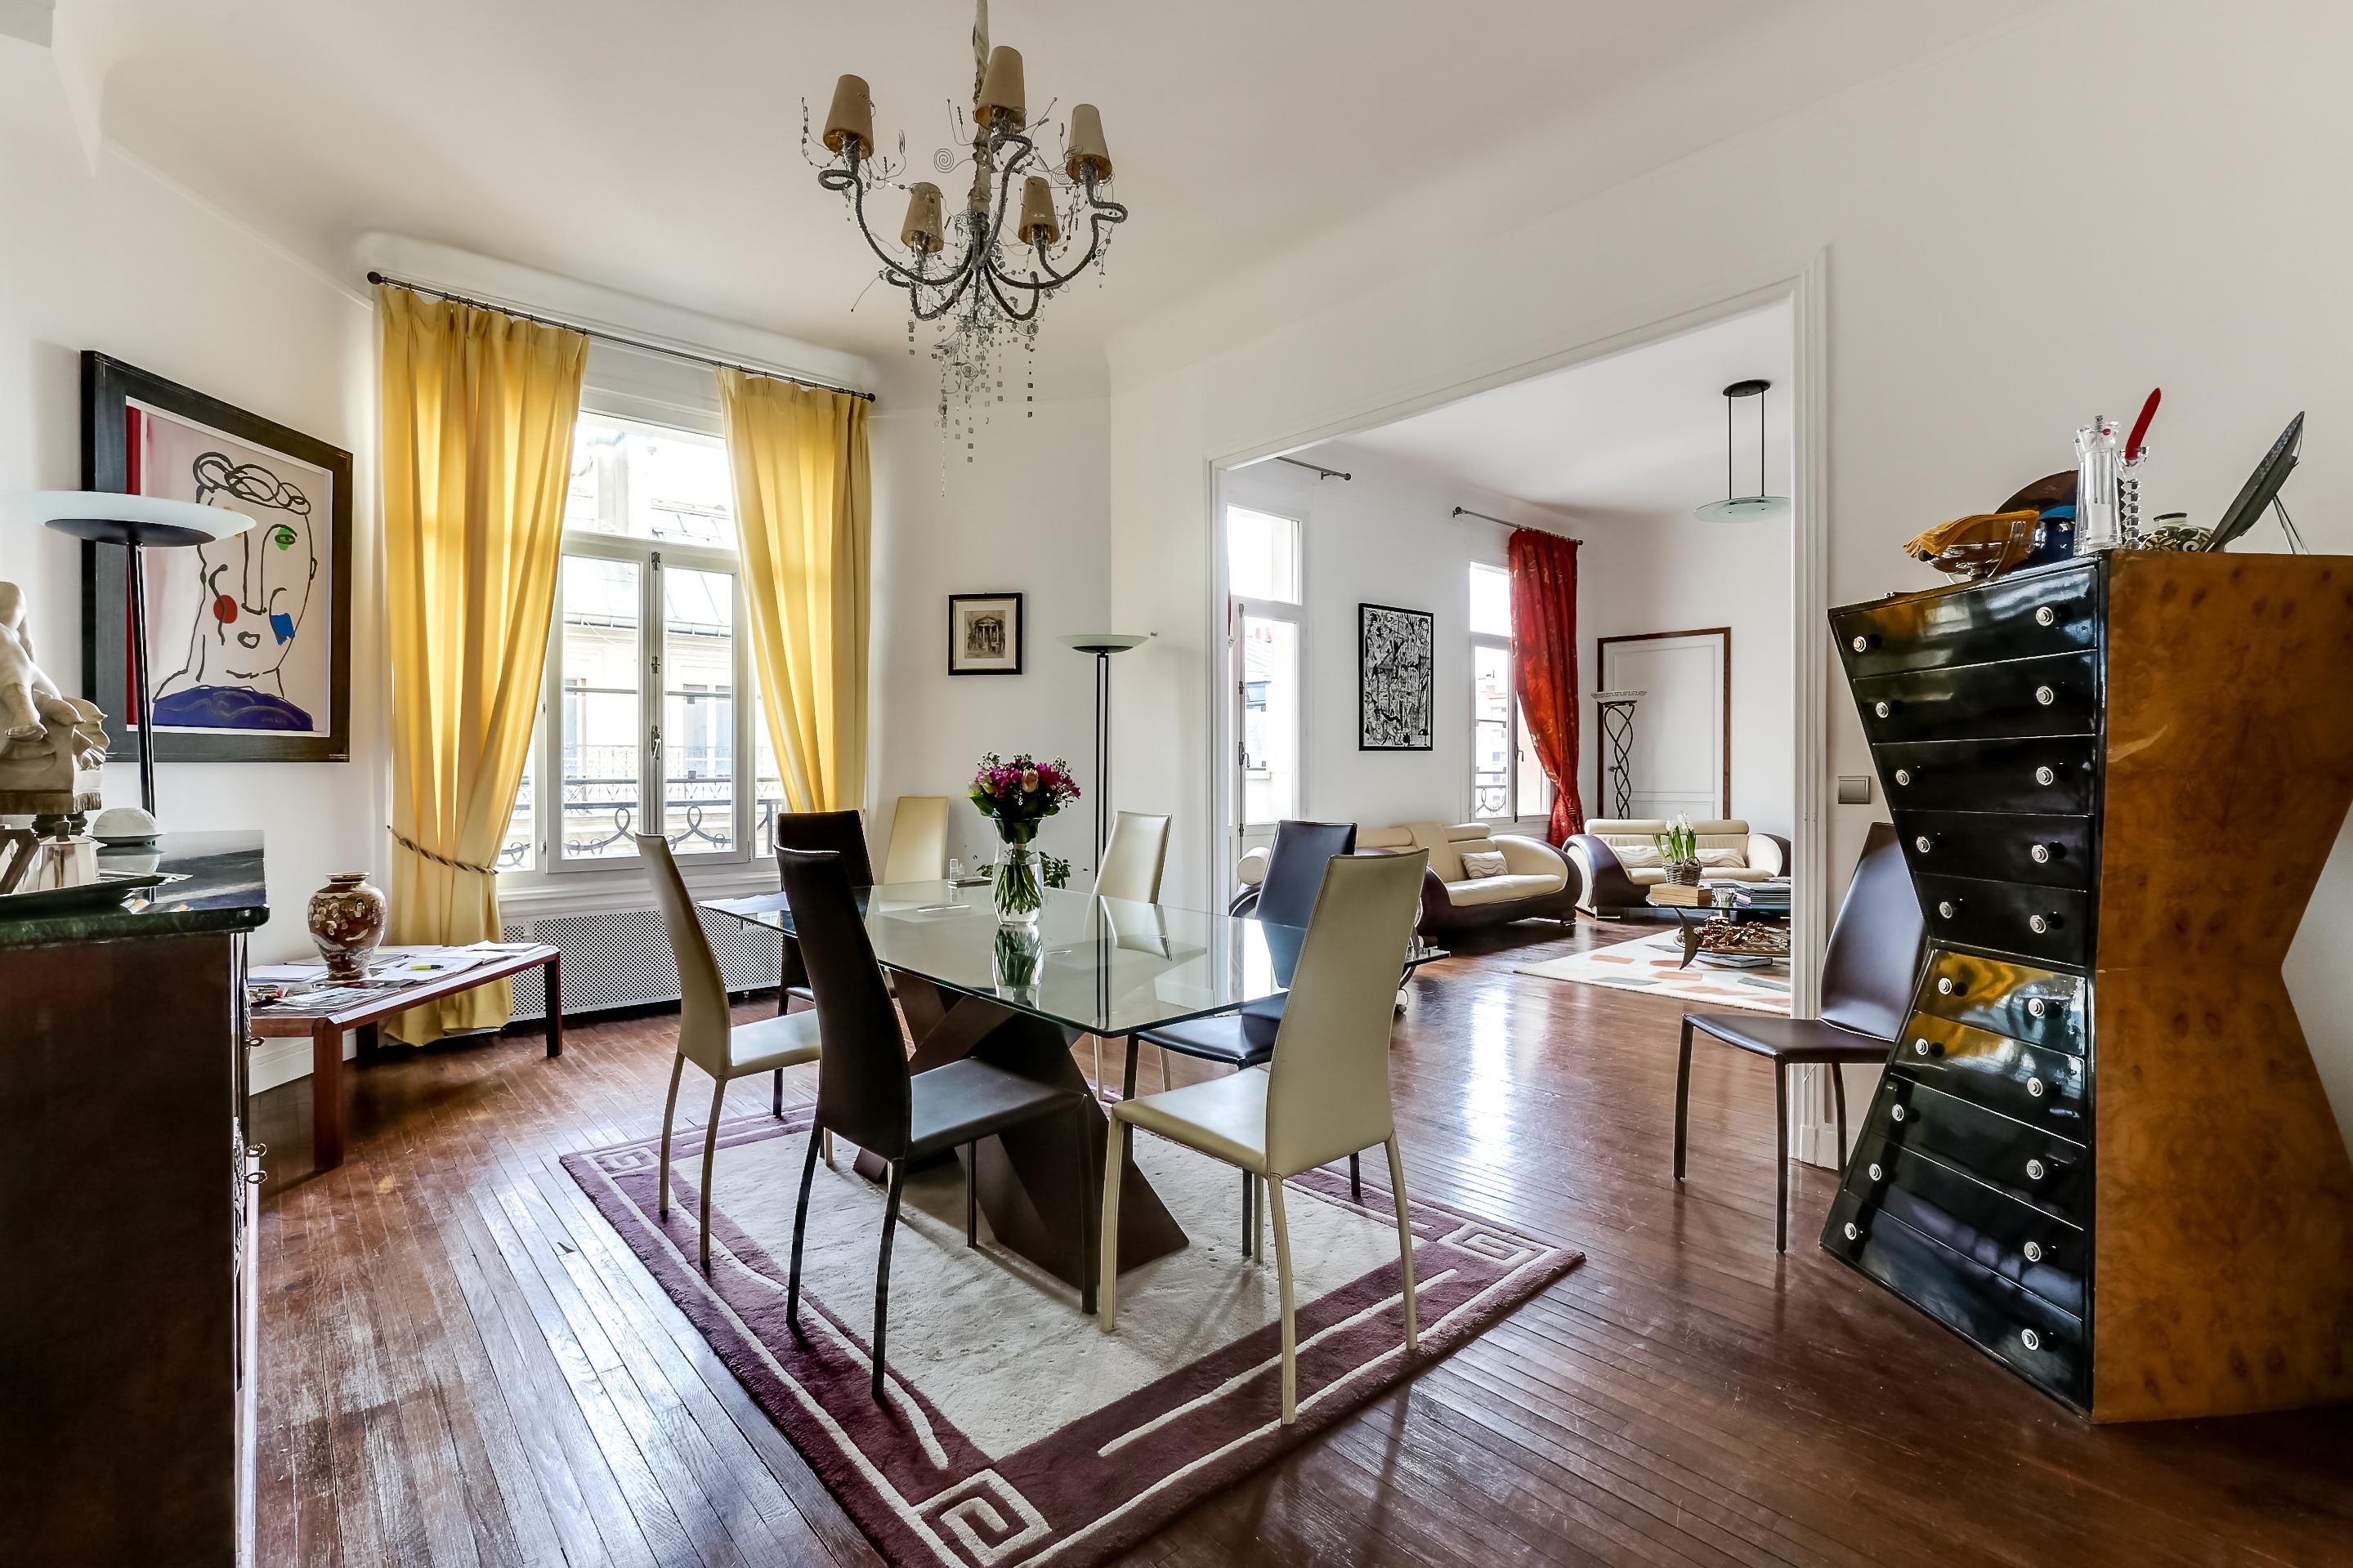 Neuilly__172_m²_3_chambres_1_bureau_(3).